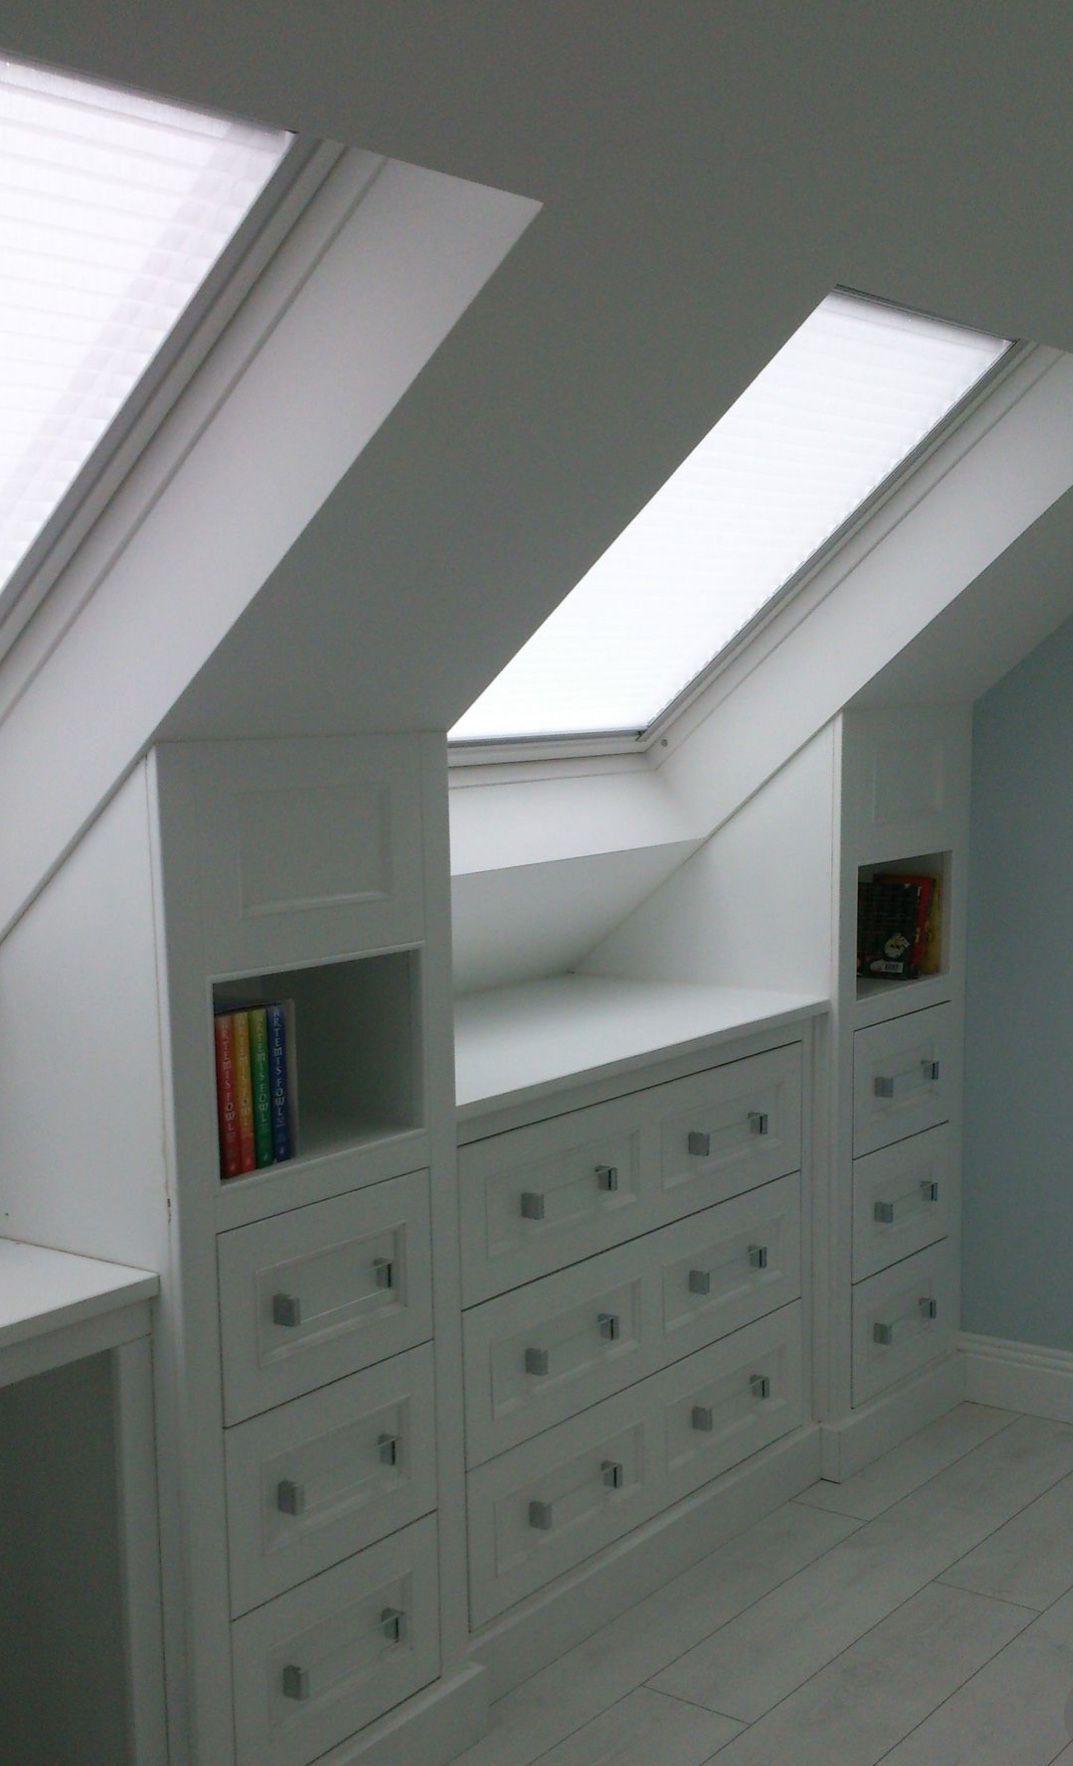 Attic Room Ideas Slanted Walls, Bedrooms, Small Attic Room Ideas, Reading,  Low